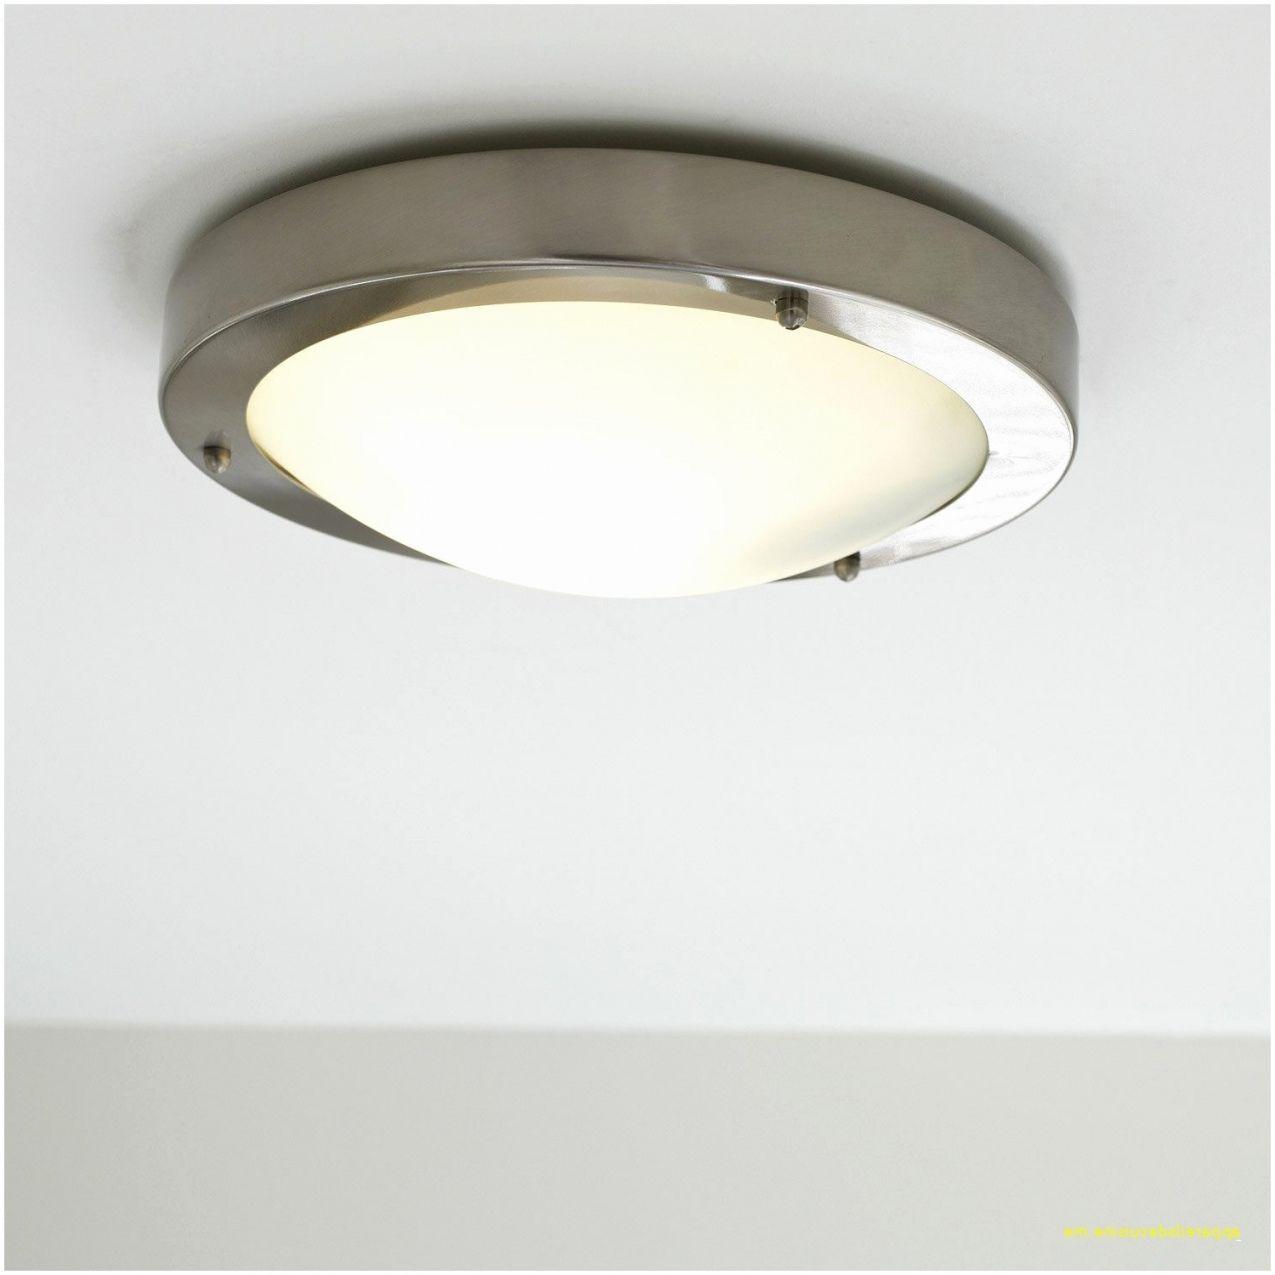 20 Plafonnier Salle De Bain Castorama 2019 Ceiling Lights Home Decor Ceiling